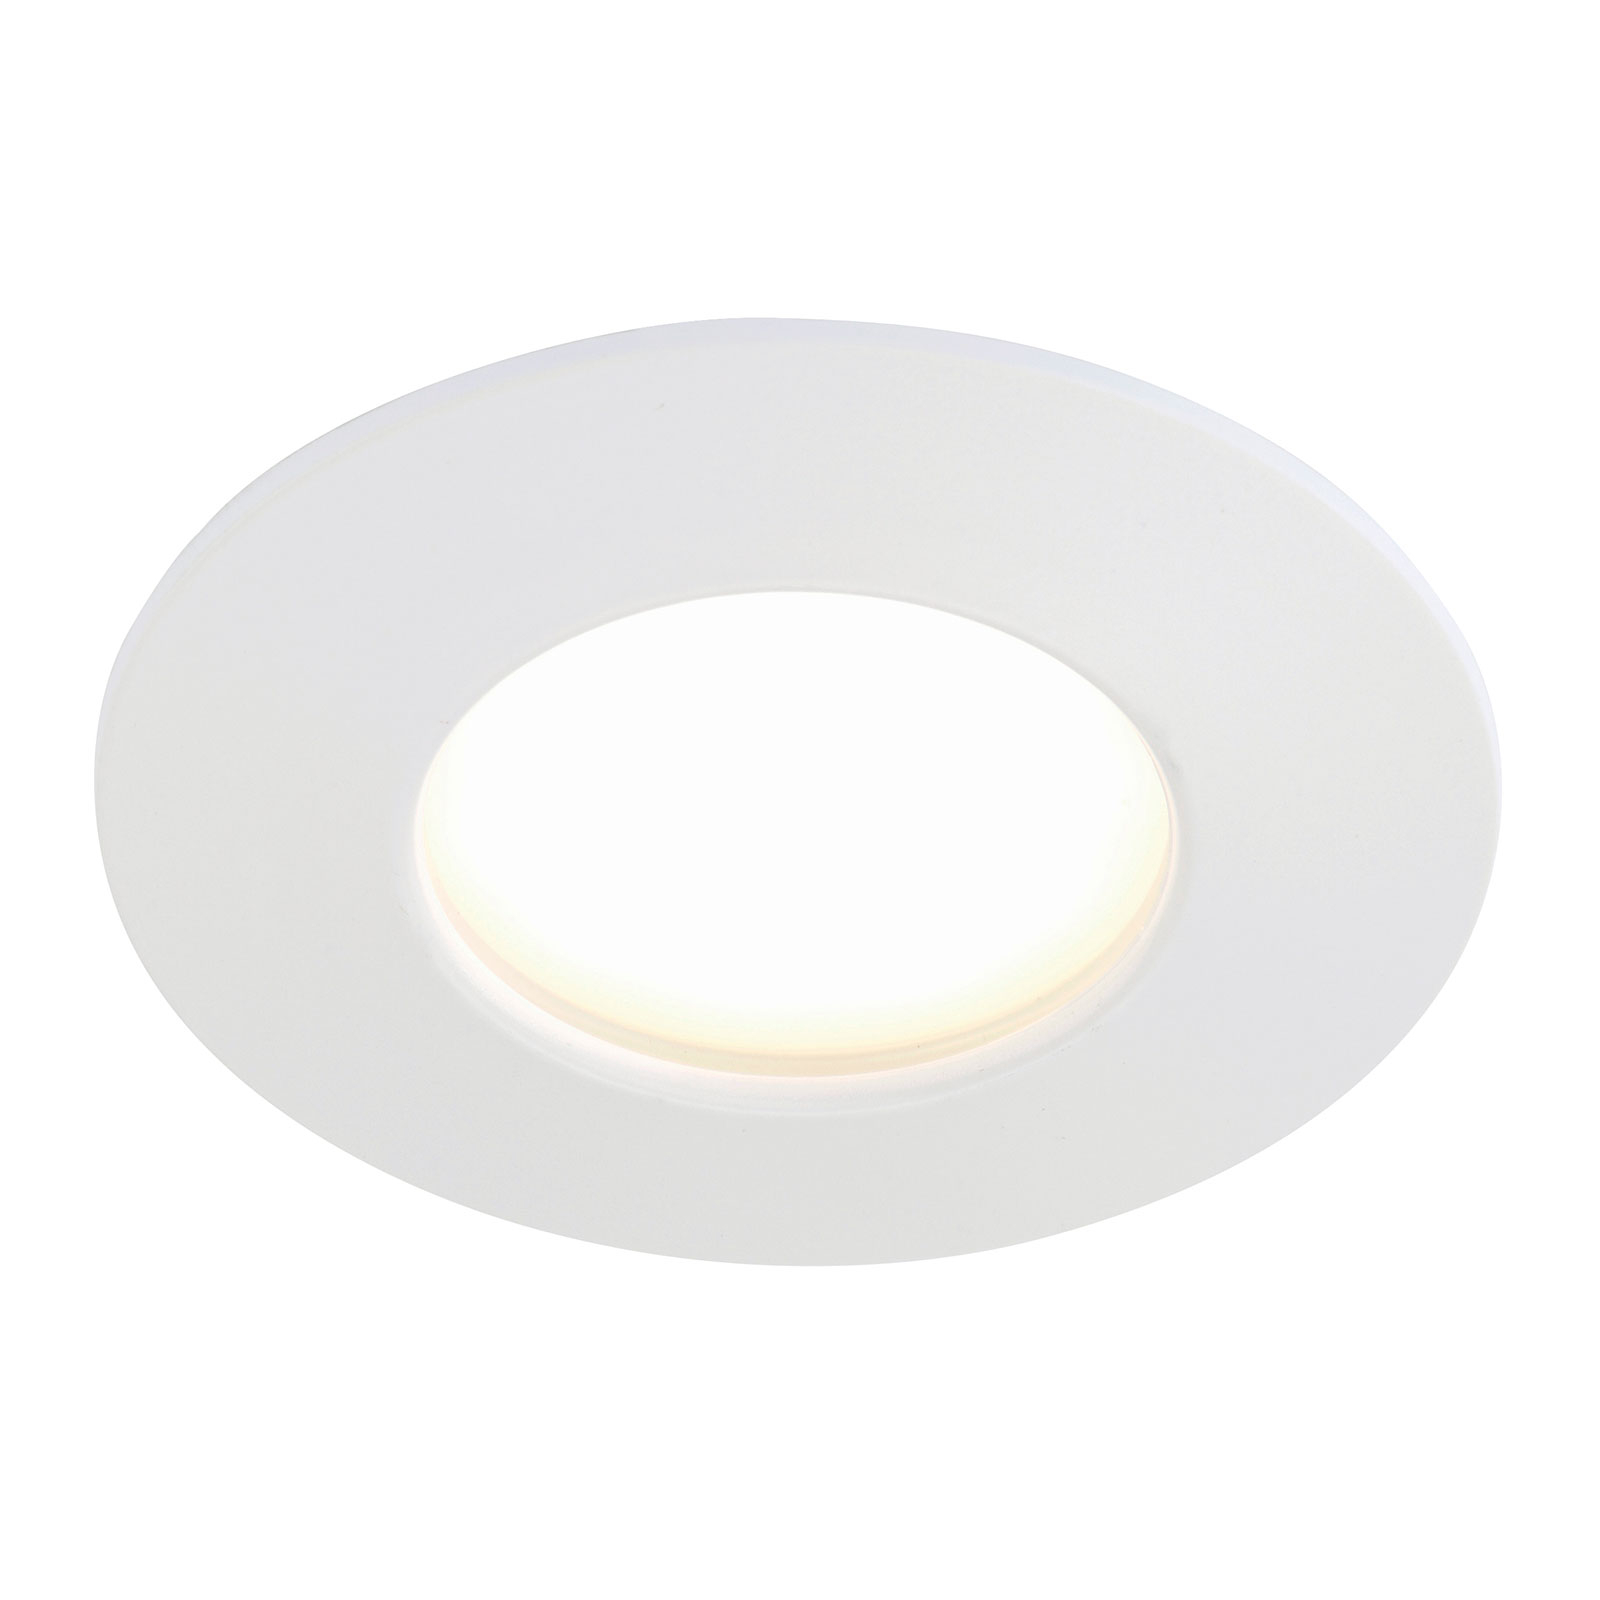 Spot LED incasso Felia, bianco, IP44